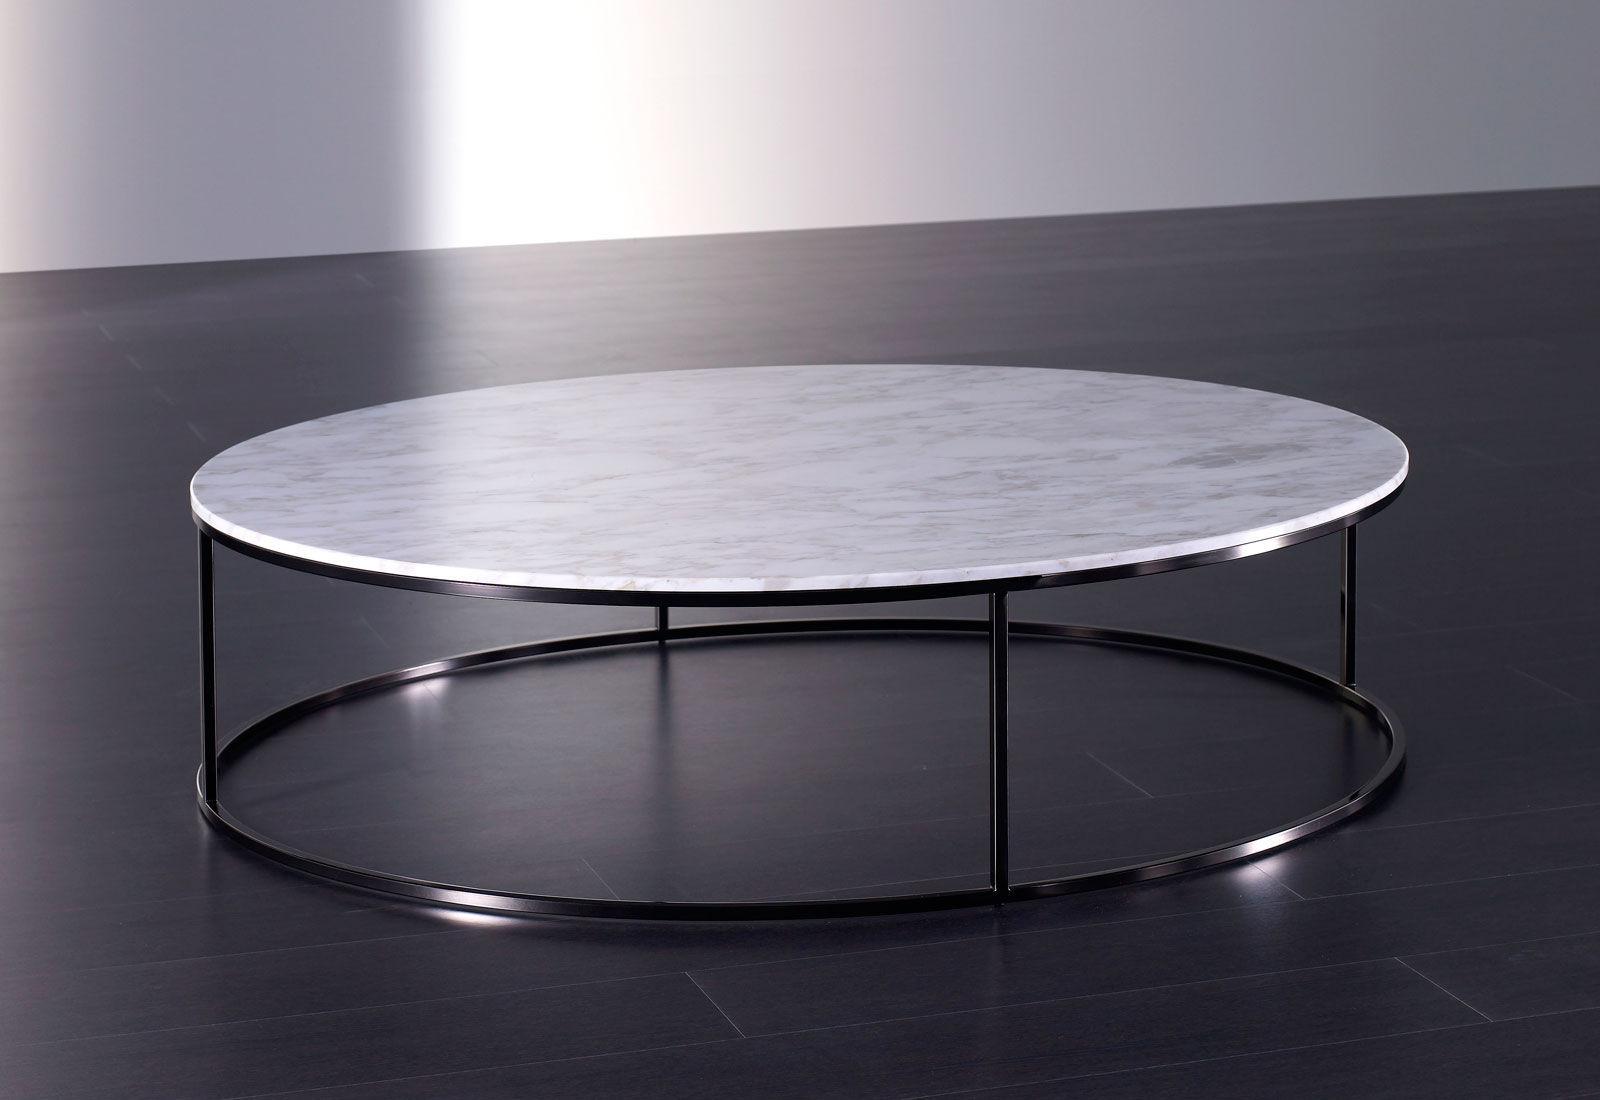 Table basse ronde contemporaine